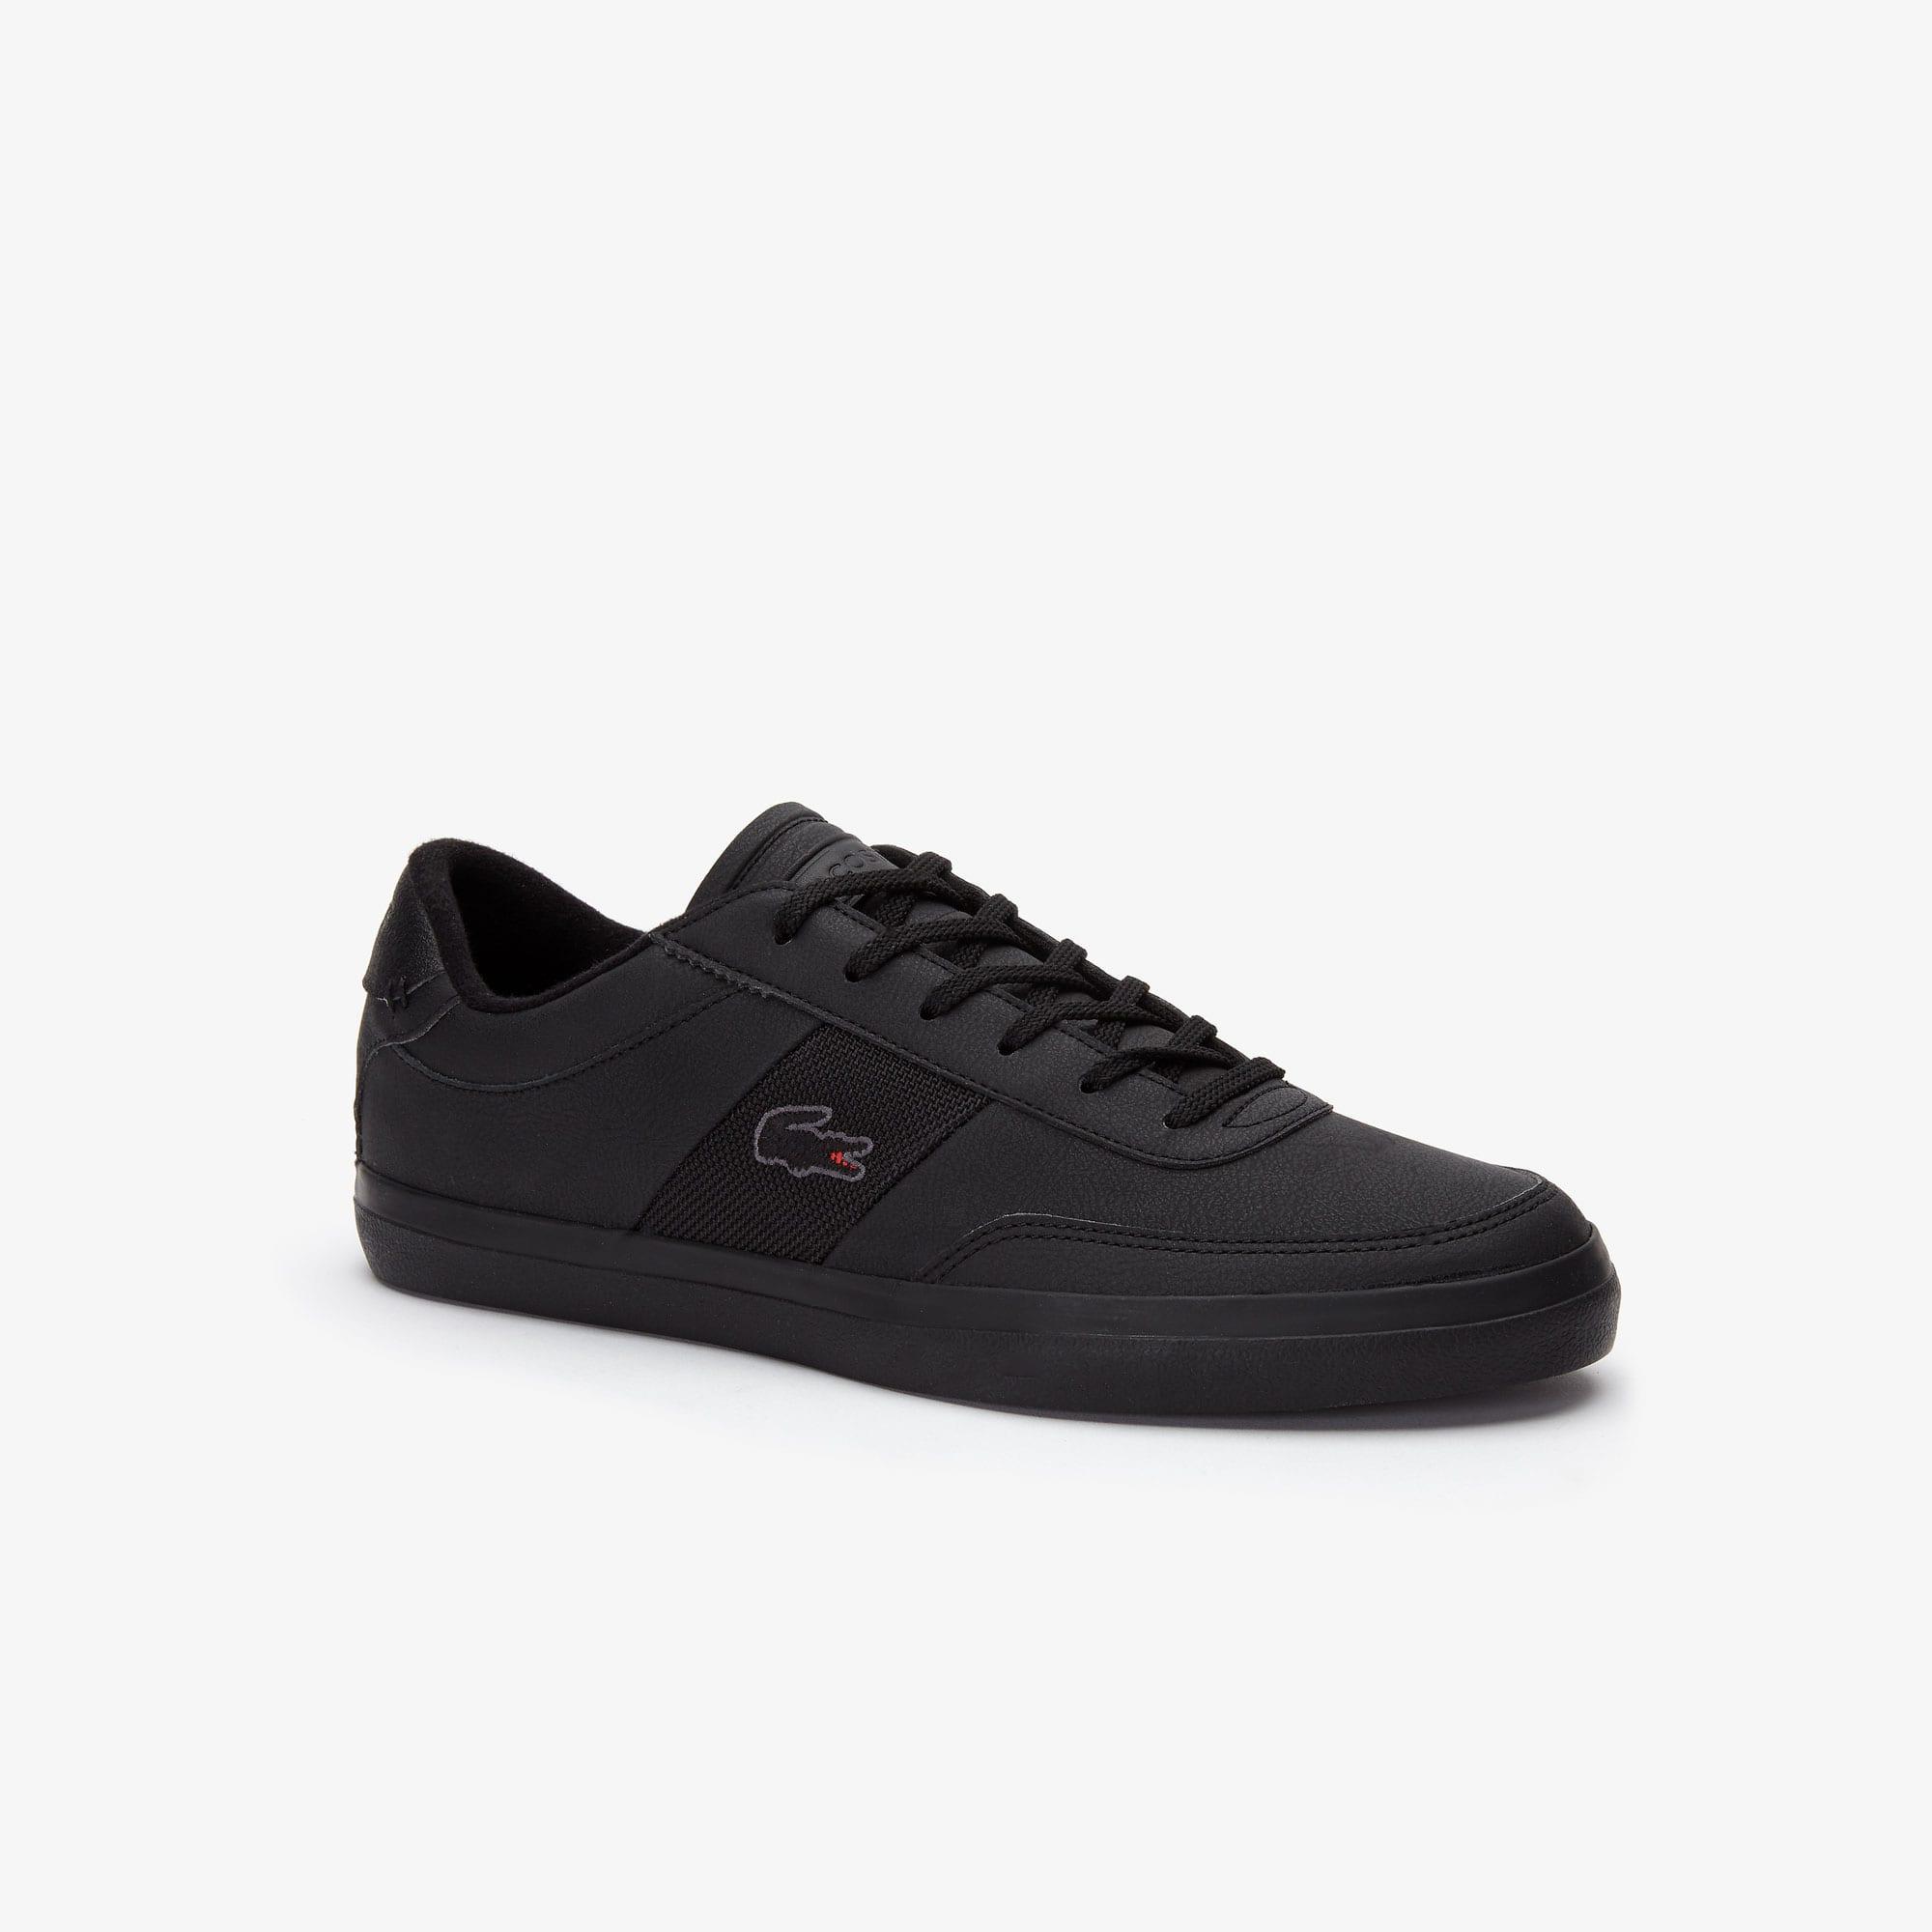 promo code d4eb5 af43b Scarpe Lacoste da uomo: sneaker, stivali, da città| LACOSTE